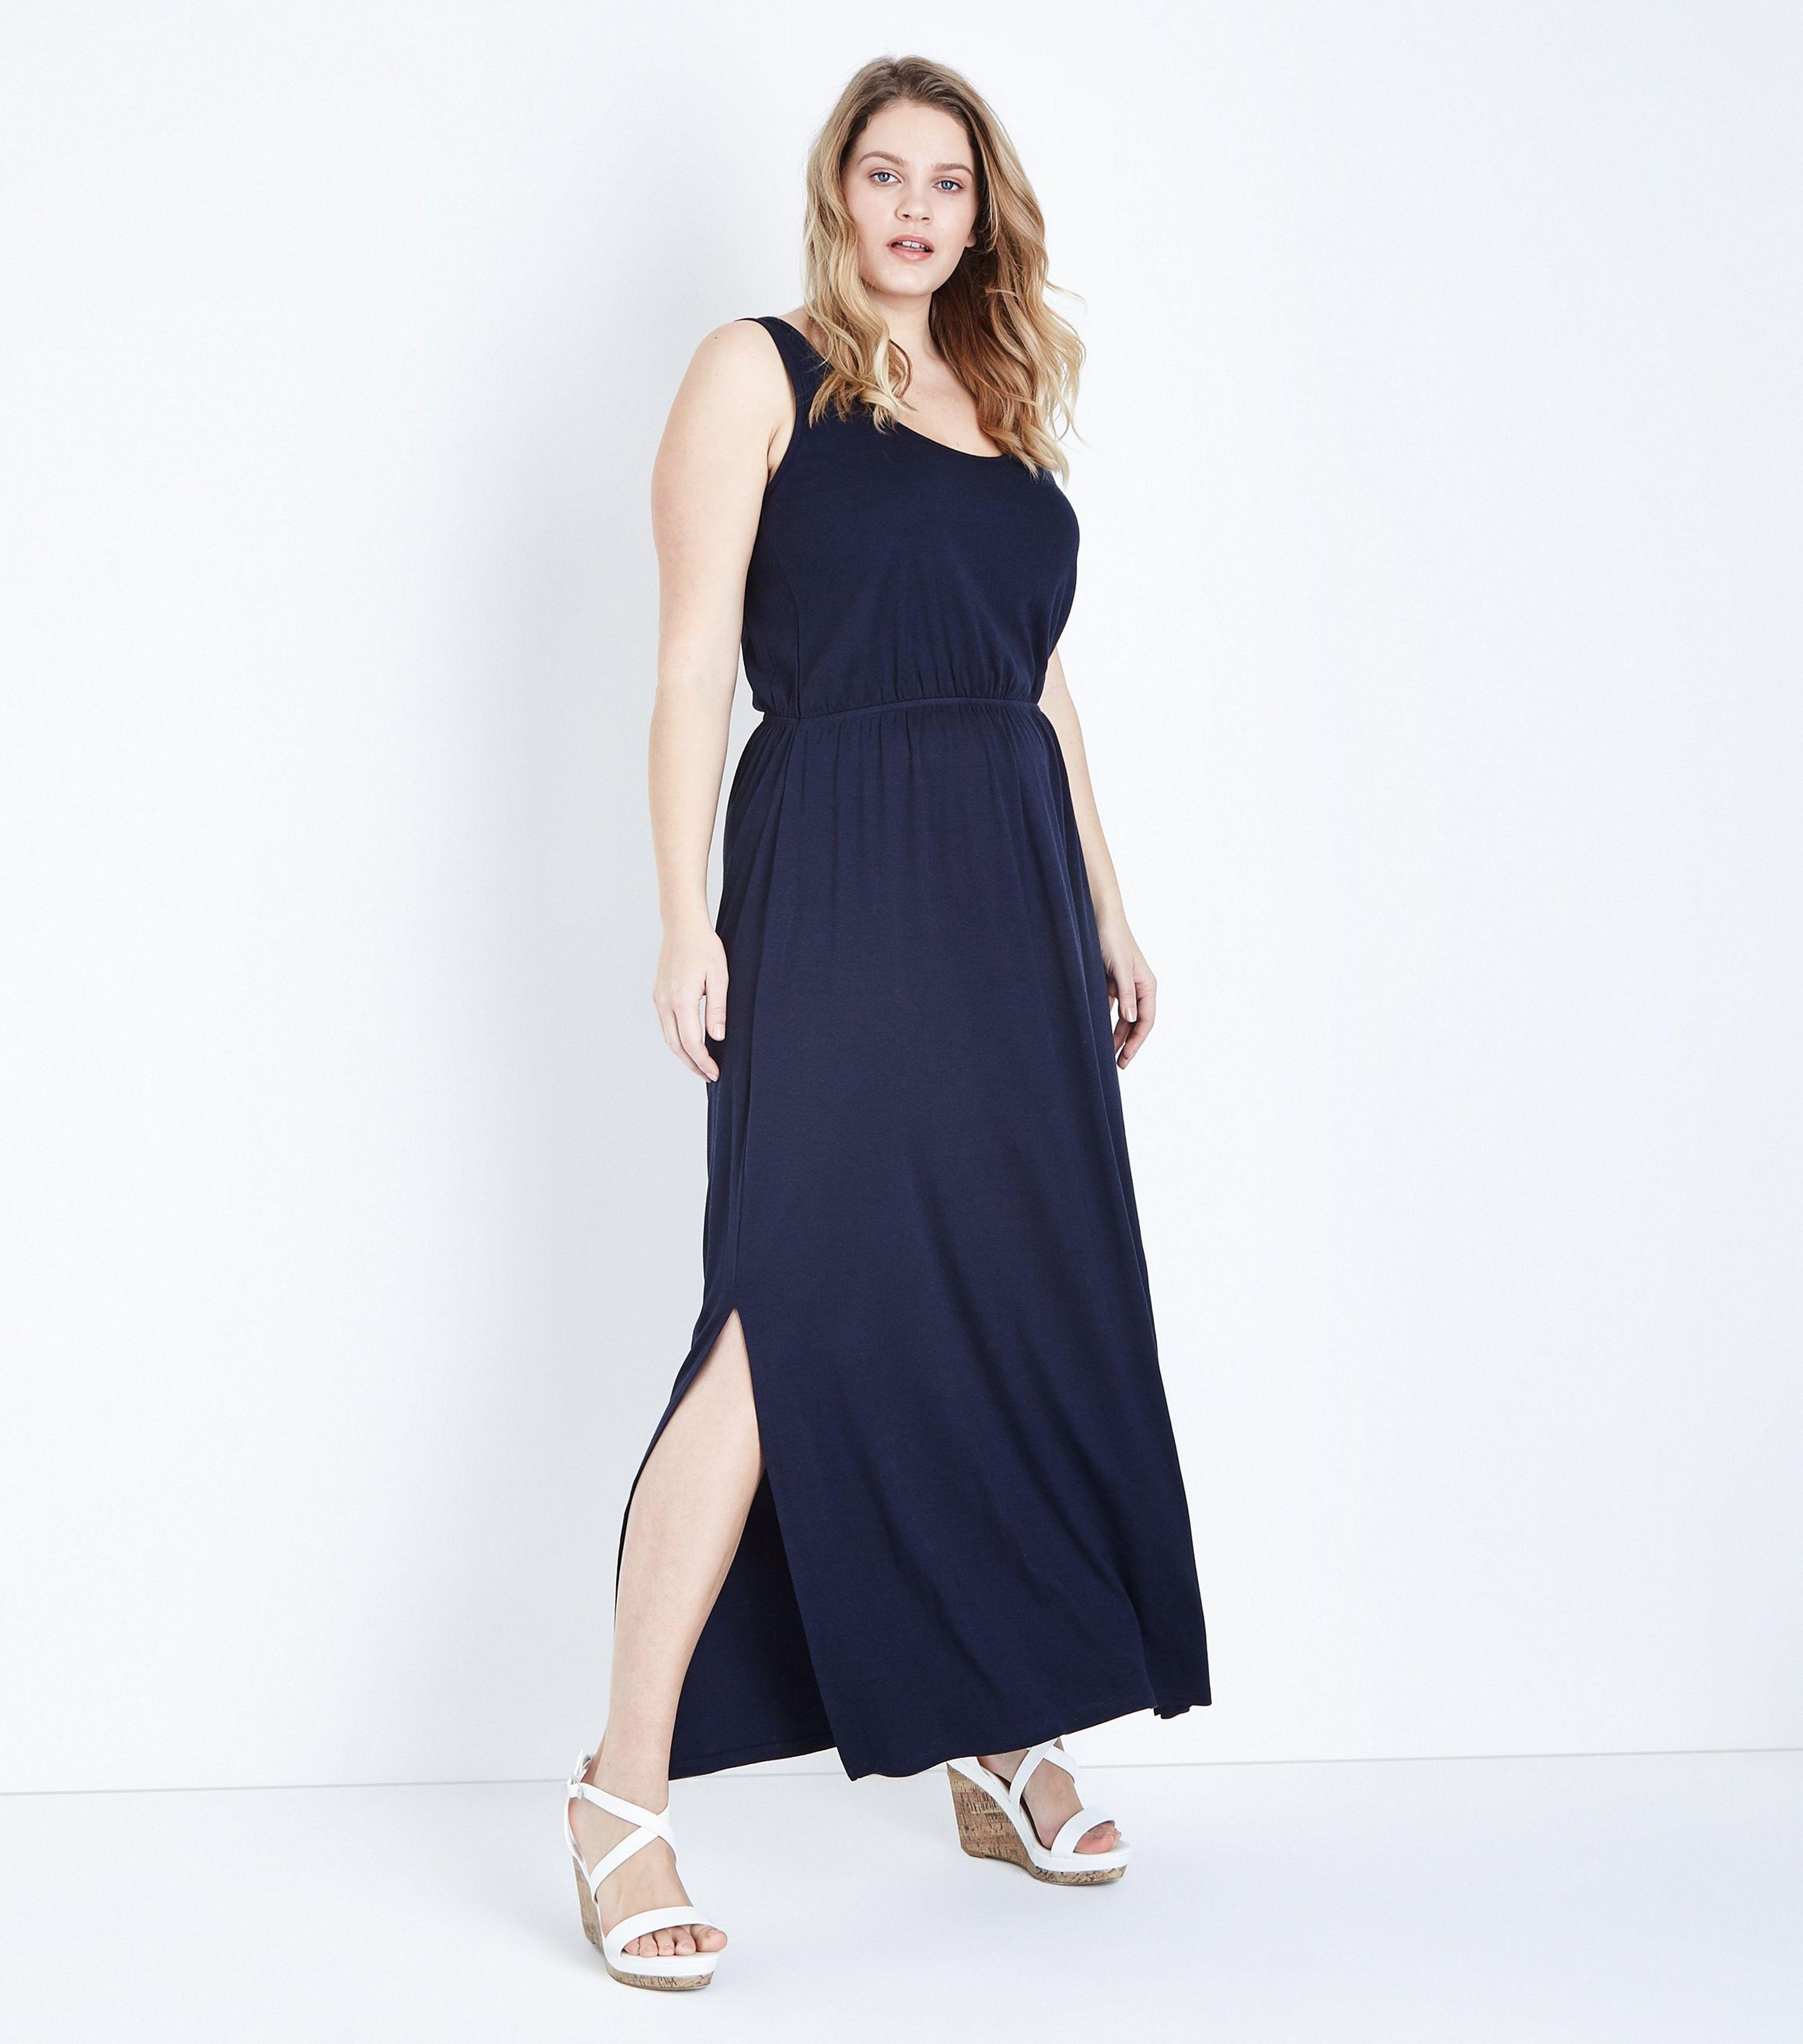 0b9ef5bb4e New Look Curves Navy Sleeveless Jersey Maxi Dress in Blue - Lyst